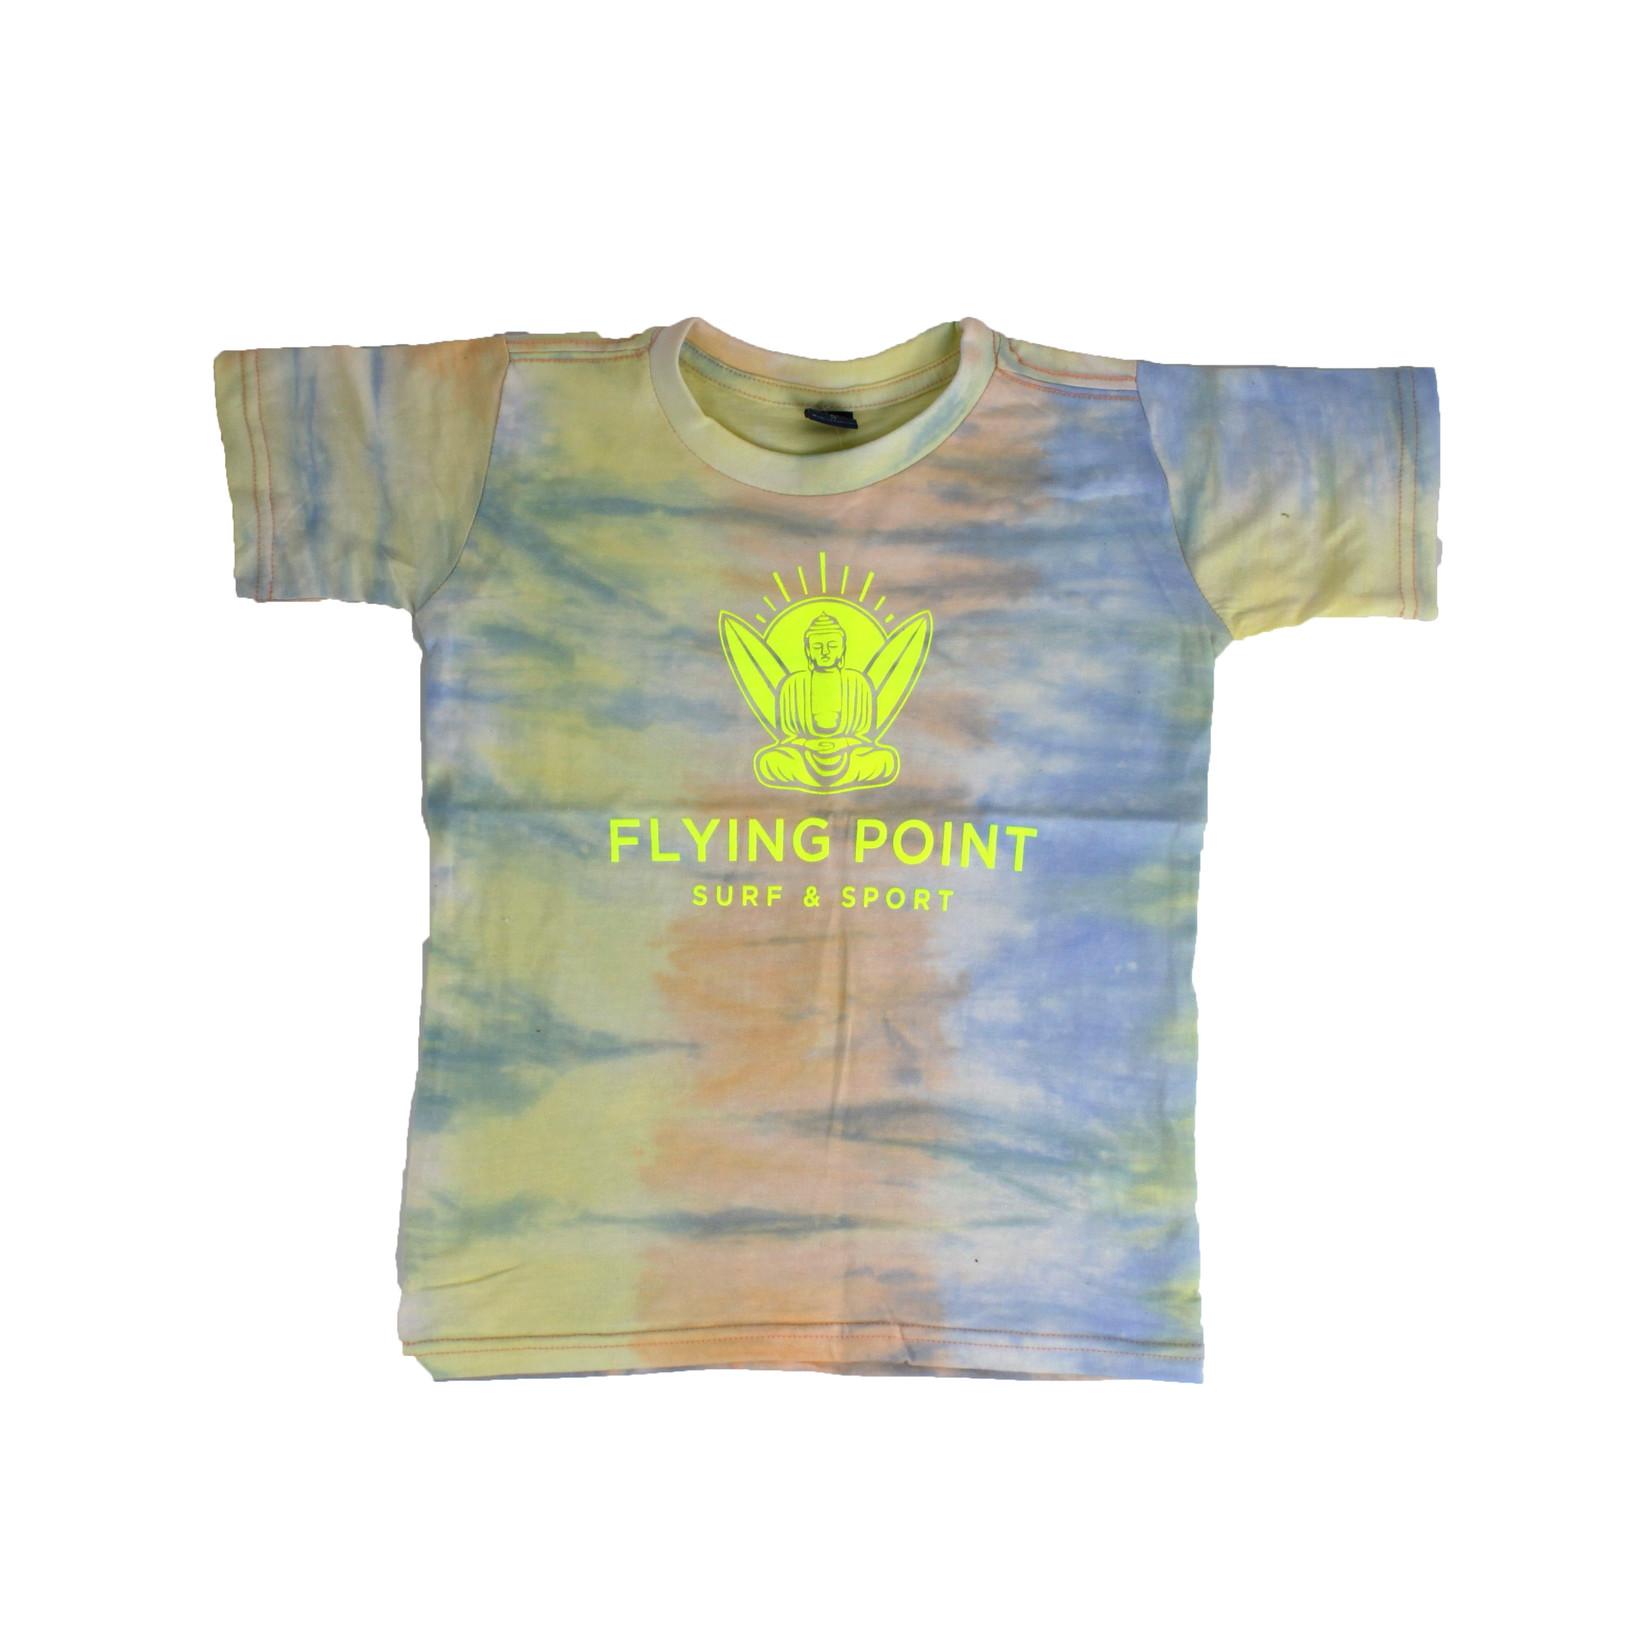 Flying Point Youth Buddha Tye Dye Tee